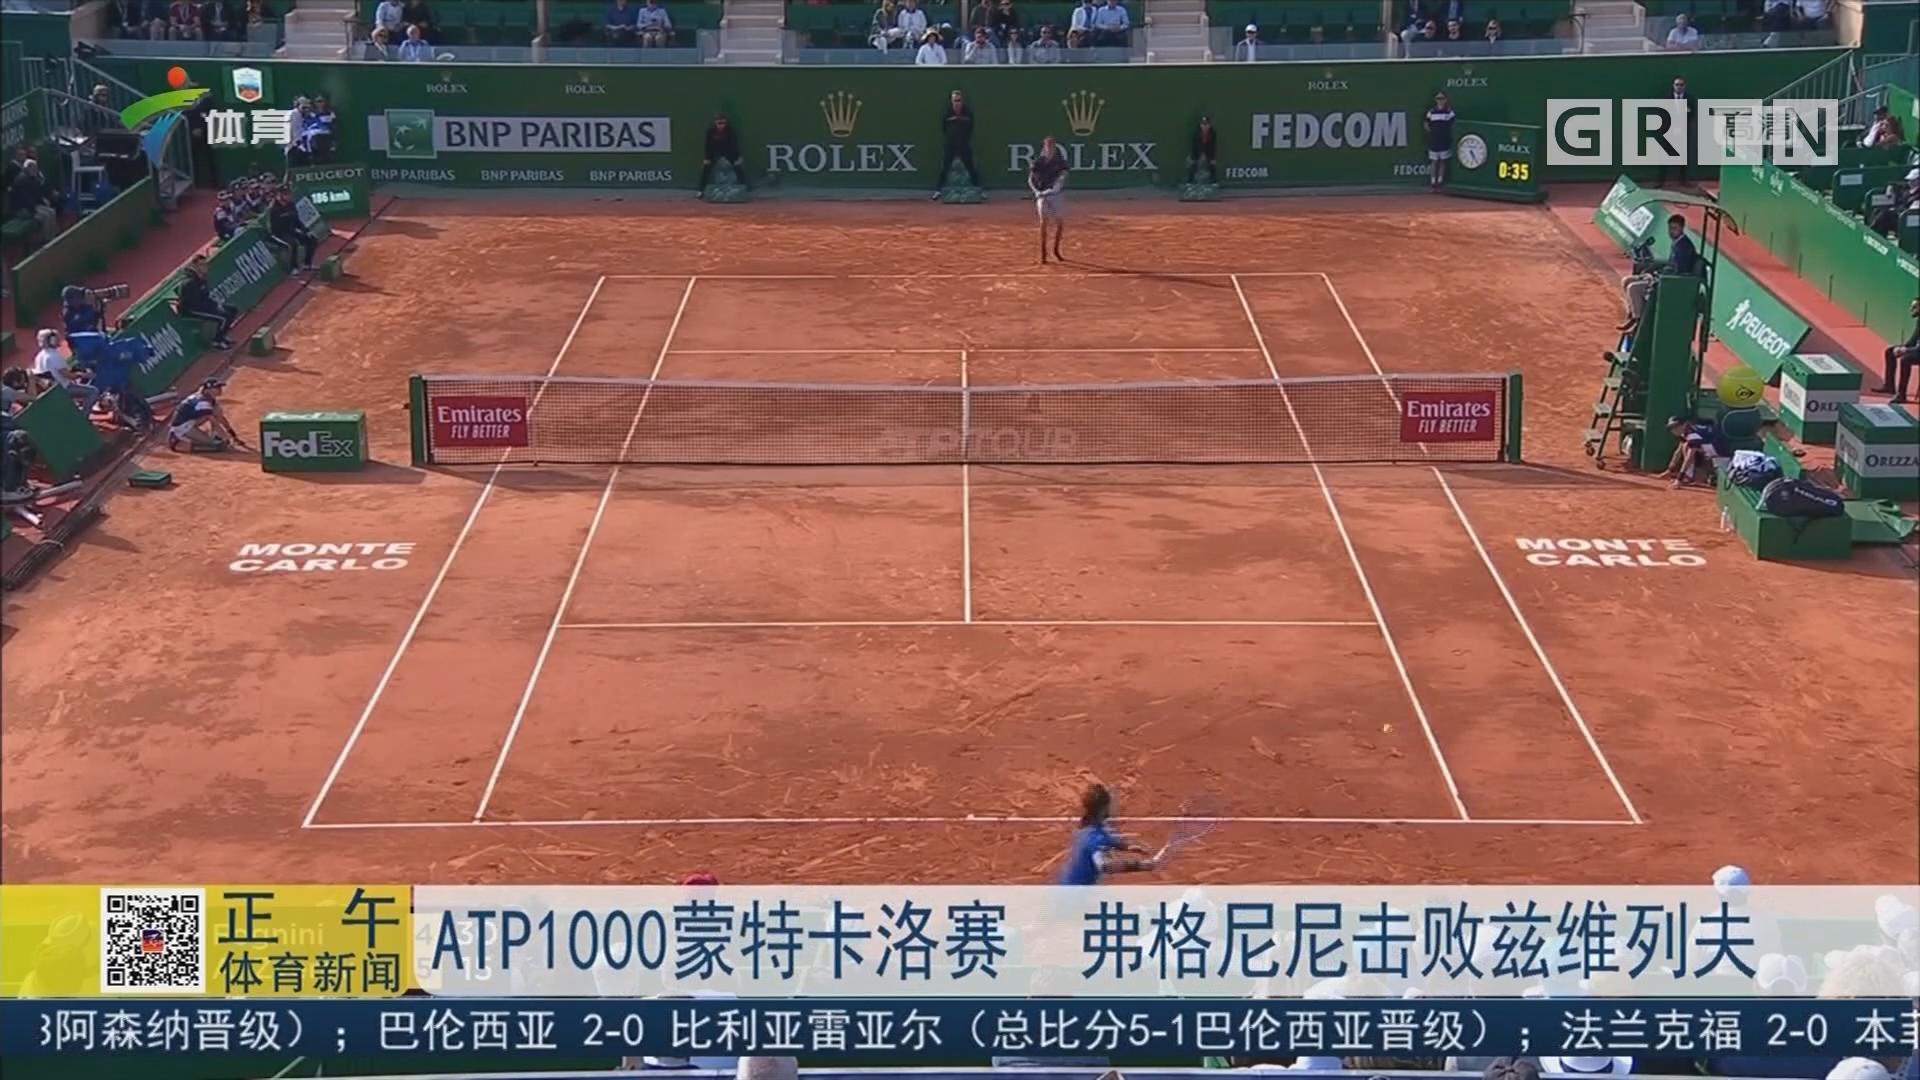 ATP1000蒙特卡洛賽 弗格尼尼擊敗茲維列夫